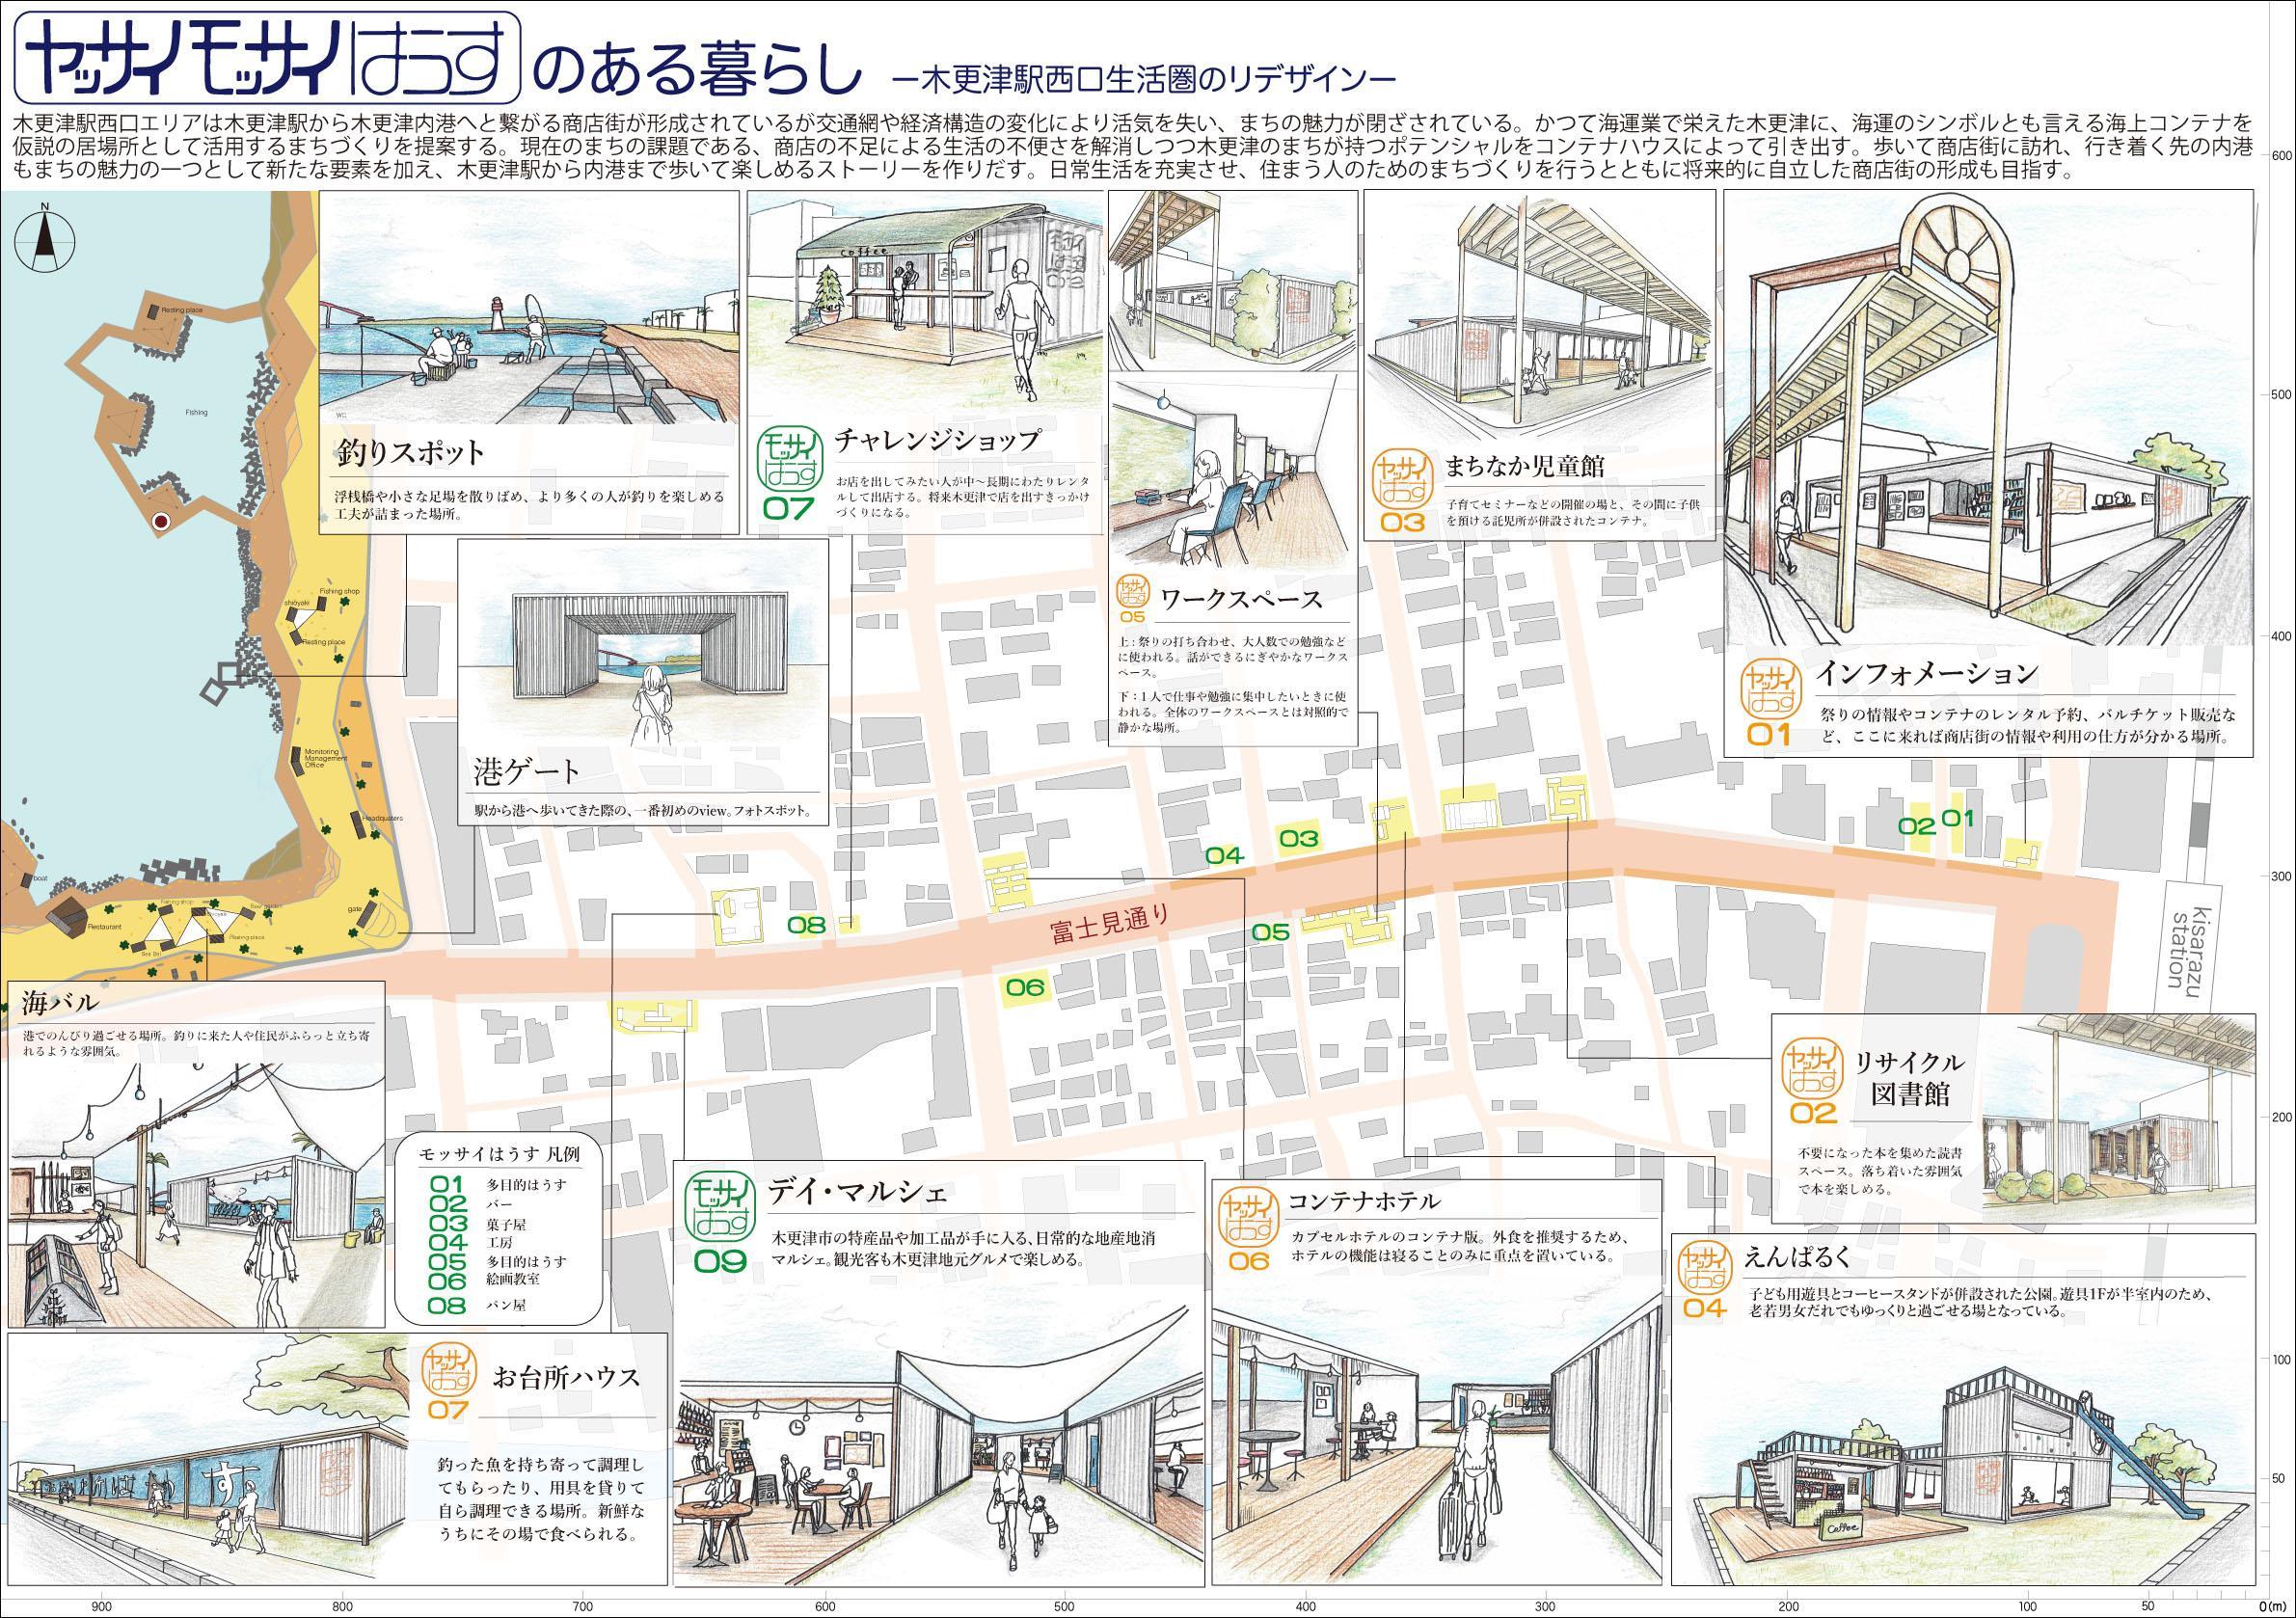 http://www.maebashi-it.ac.jp/department/ide/upload/2be8718c8a3554fe5dc22680b03b1674f3ec68d4.jpg